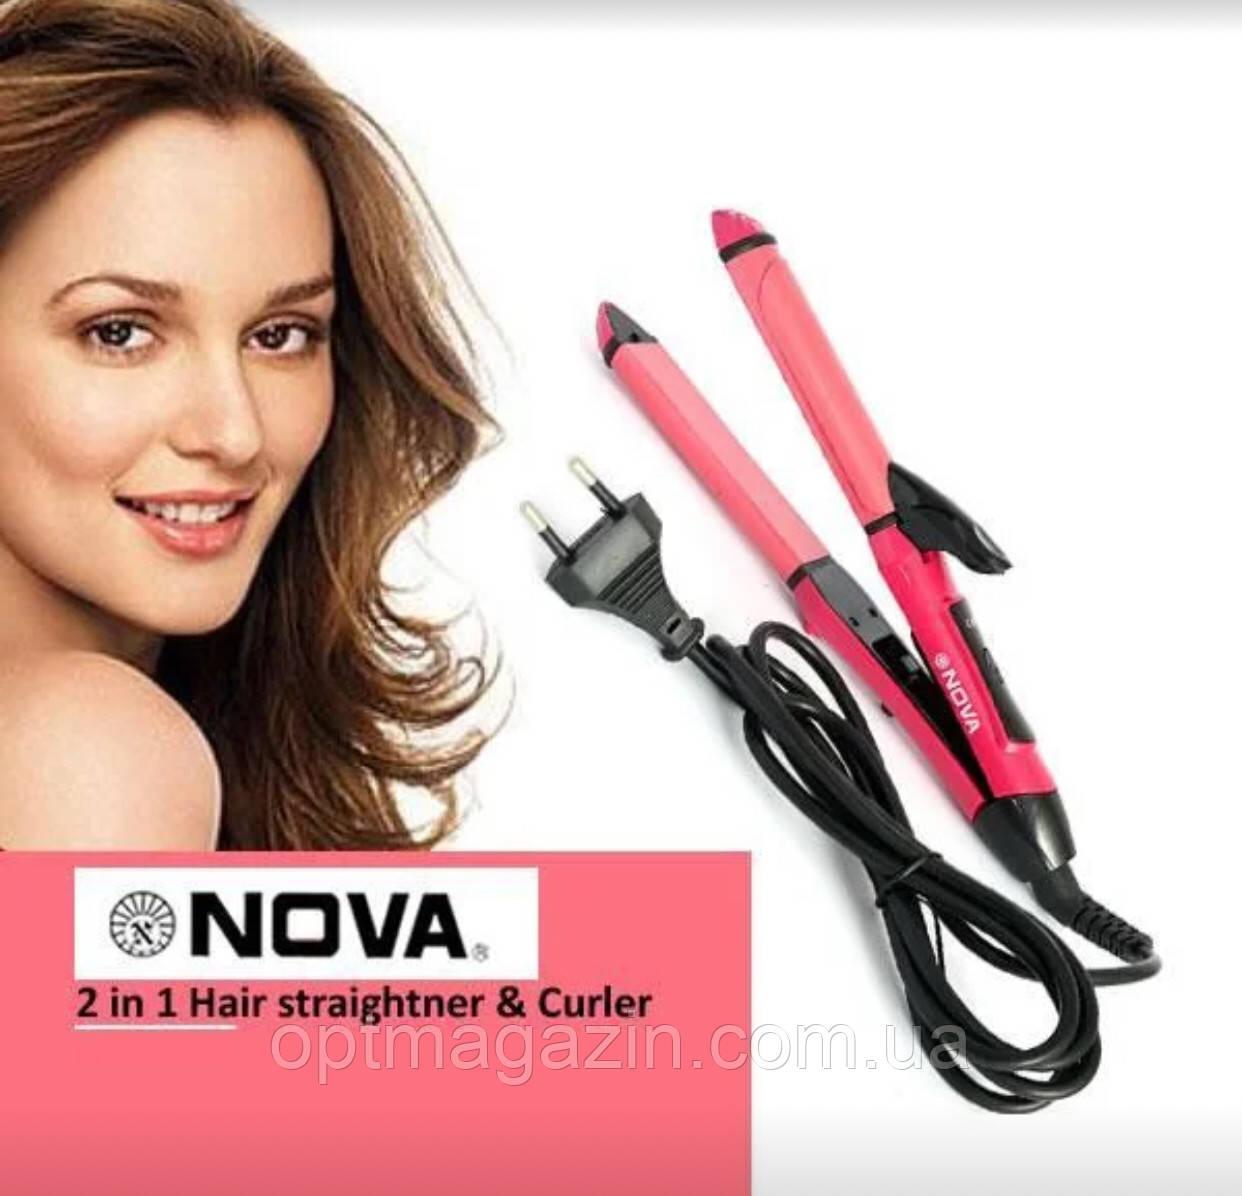 Плойка-випрямляч для волосся 2 в 1 Nova NHC 2009